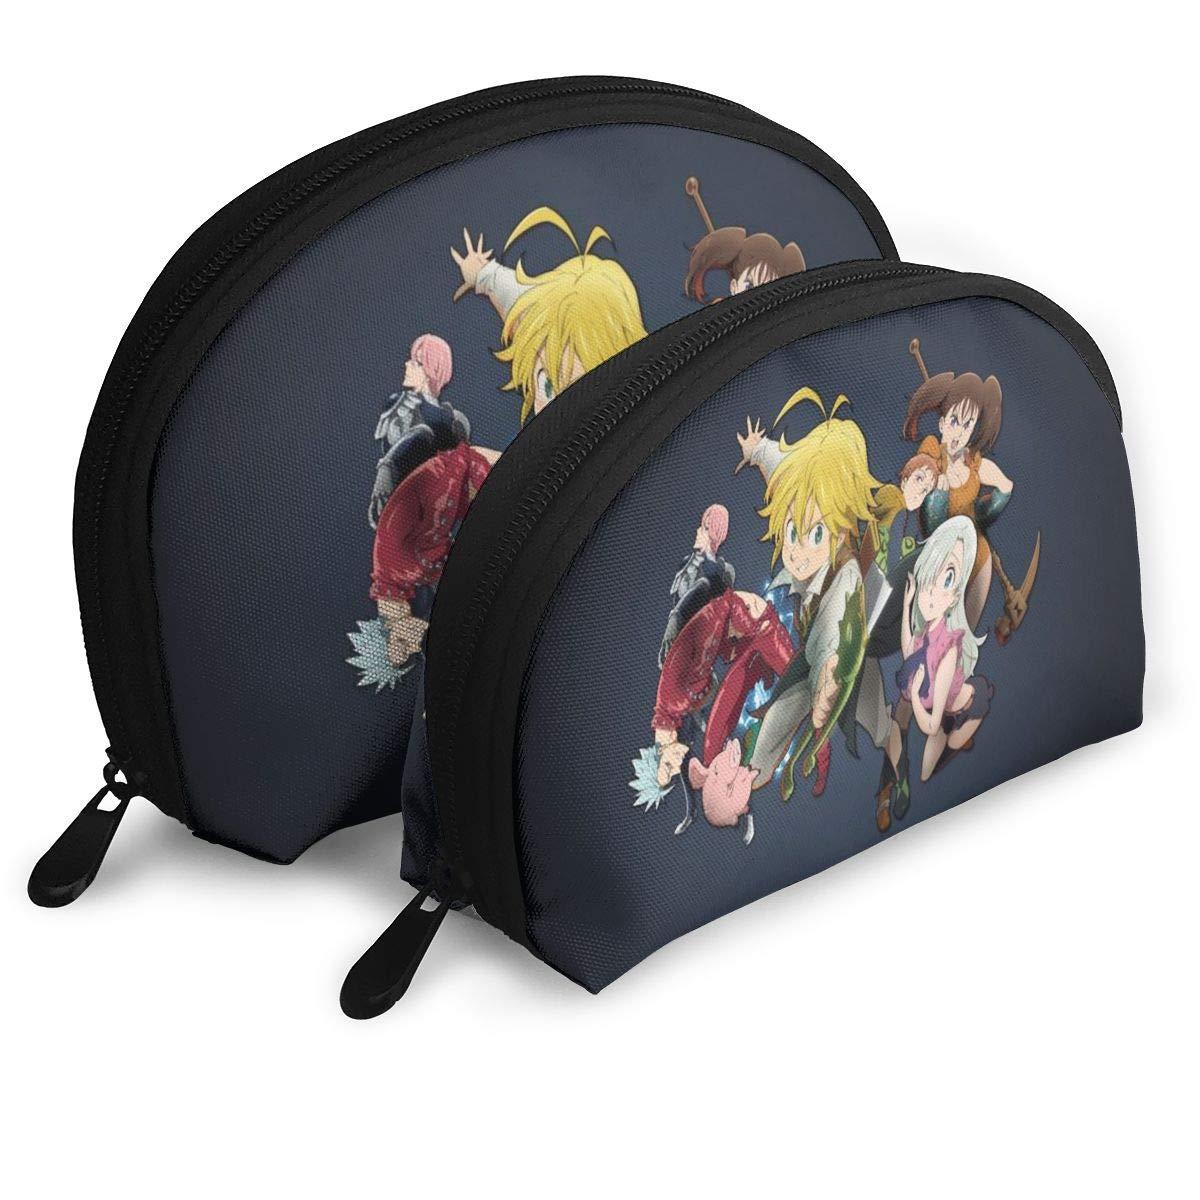 The Seven Deadly Sins Makeup Bag Portable Bags Clutch Pouch Coin Purse For Women Multifunction Handbag Organizer Travel Storage Bag Shell Shape With Zipper (2 Pcs)